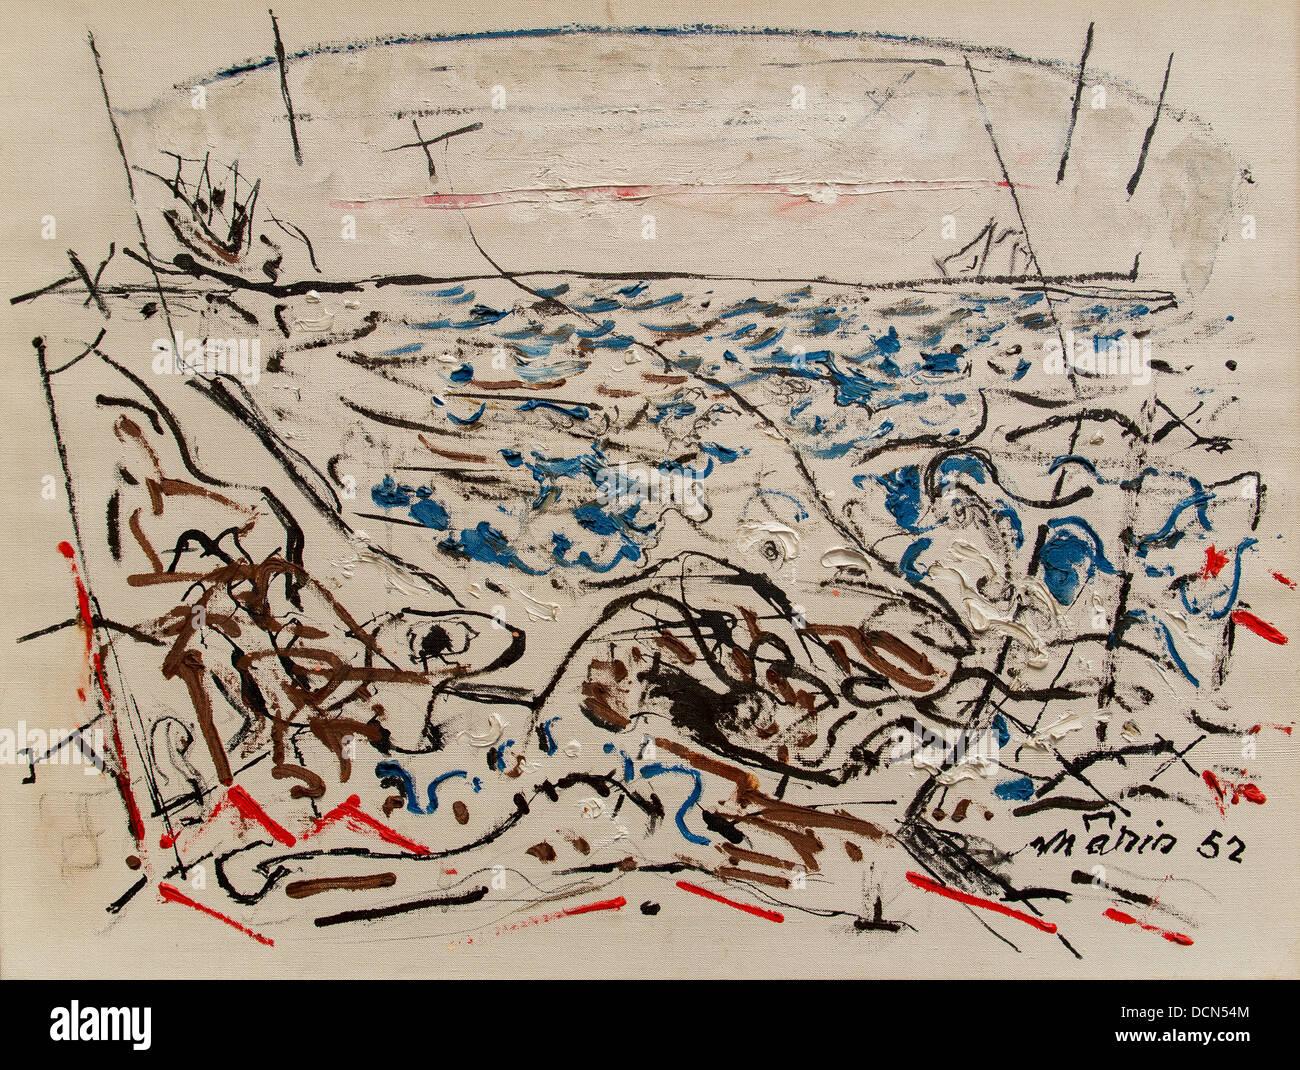 Siglo XX - el mar escrito - Juan Marín (1952) Philippe Sauvan-Magnet / Museo Activo Imagen De Stock